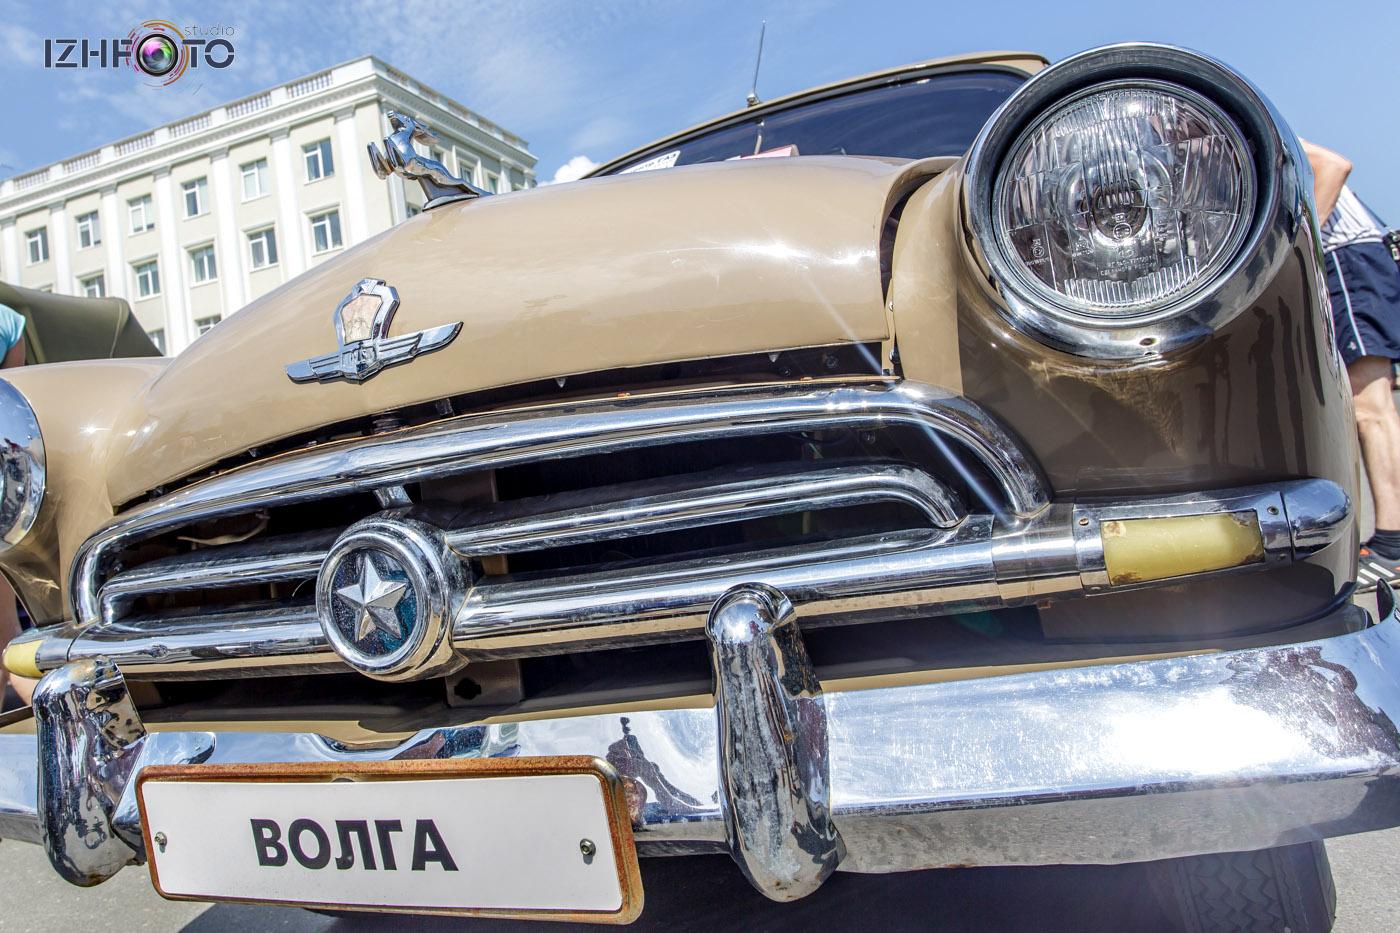 Автомобиль Волга ретро Фото